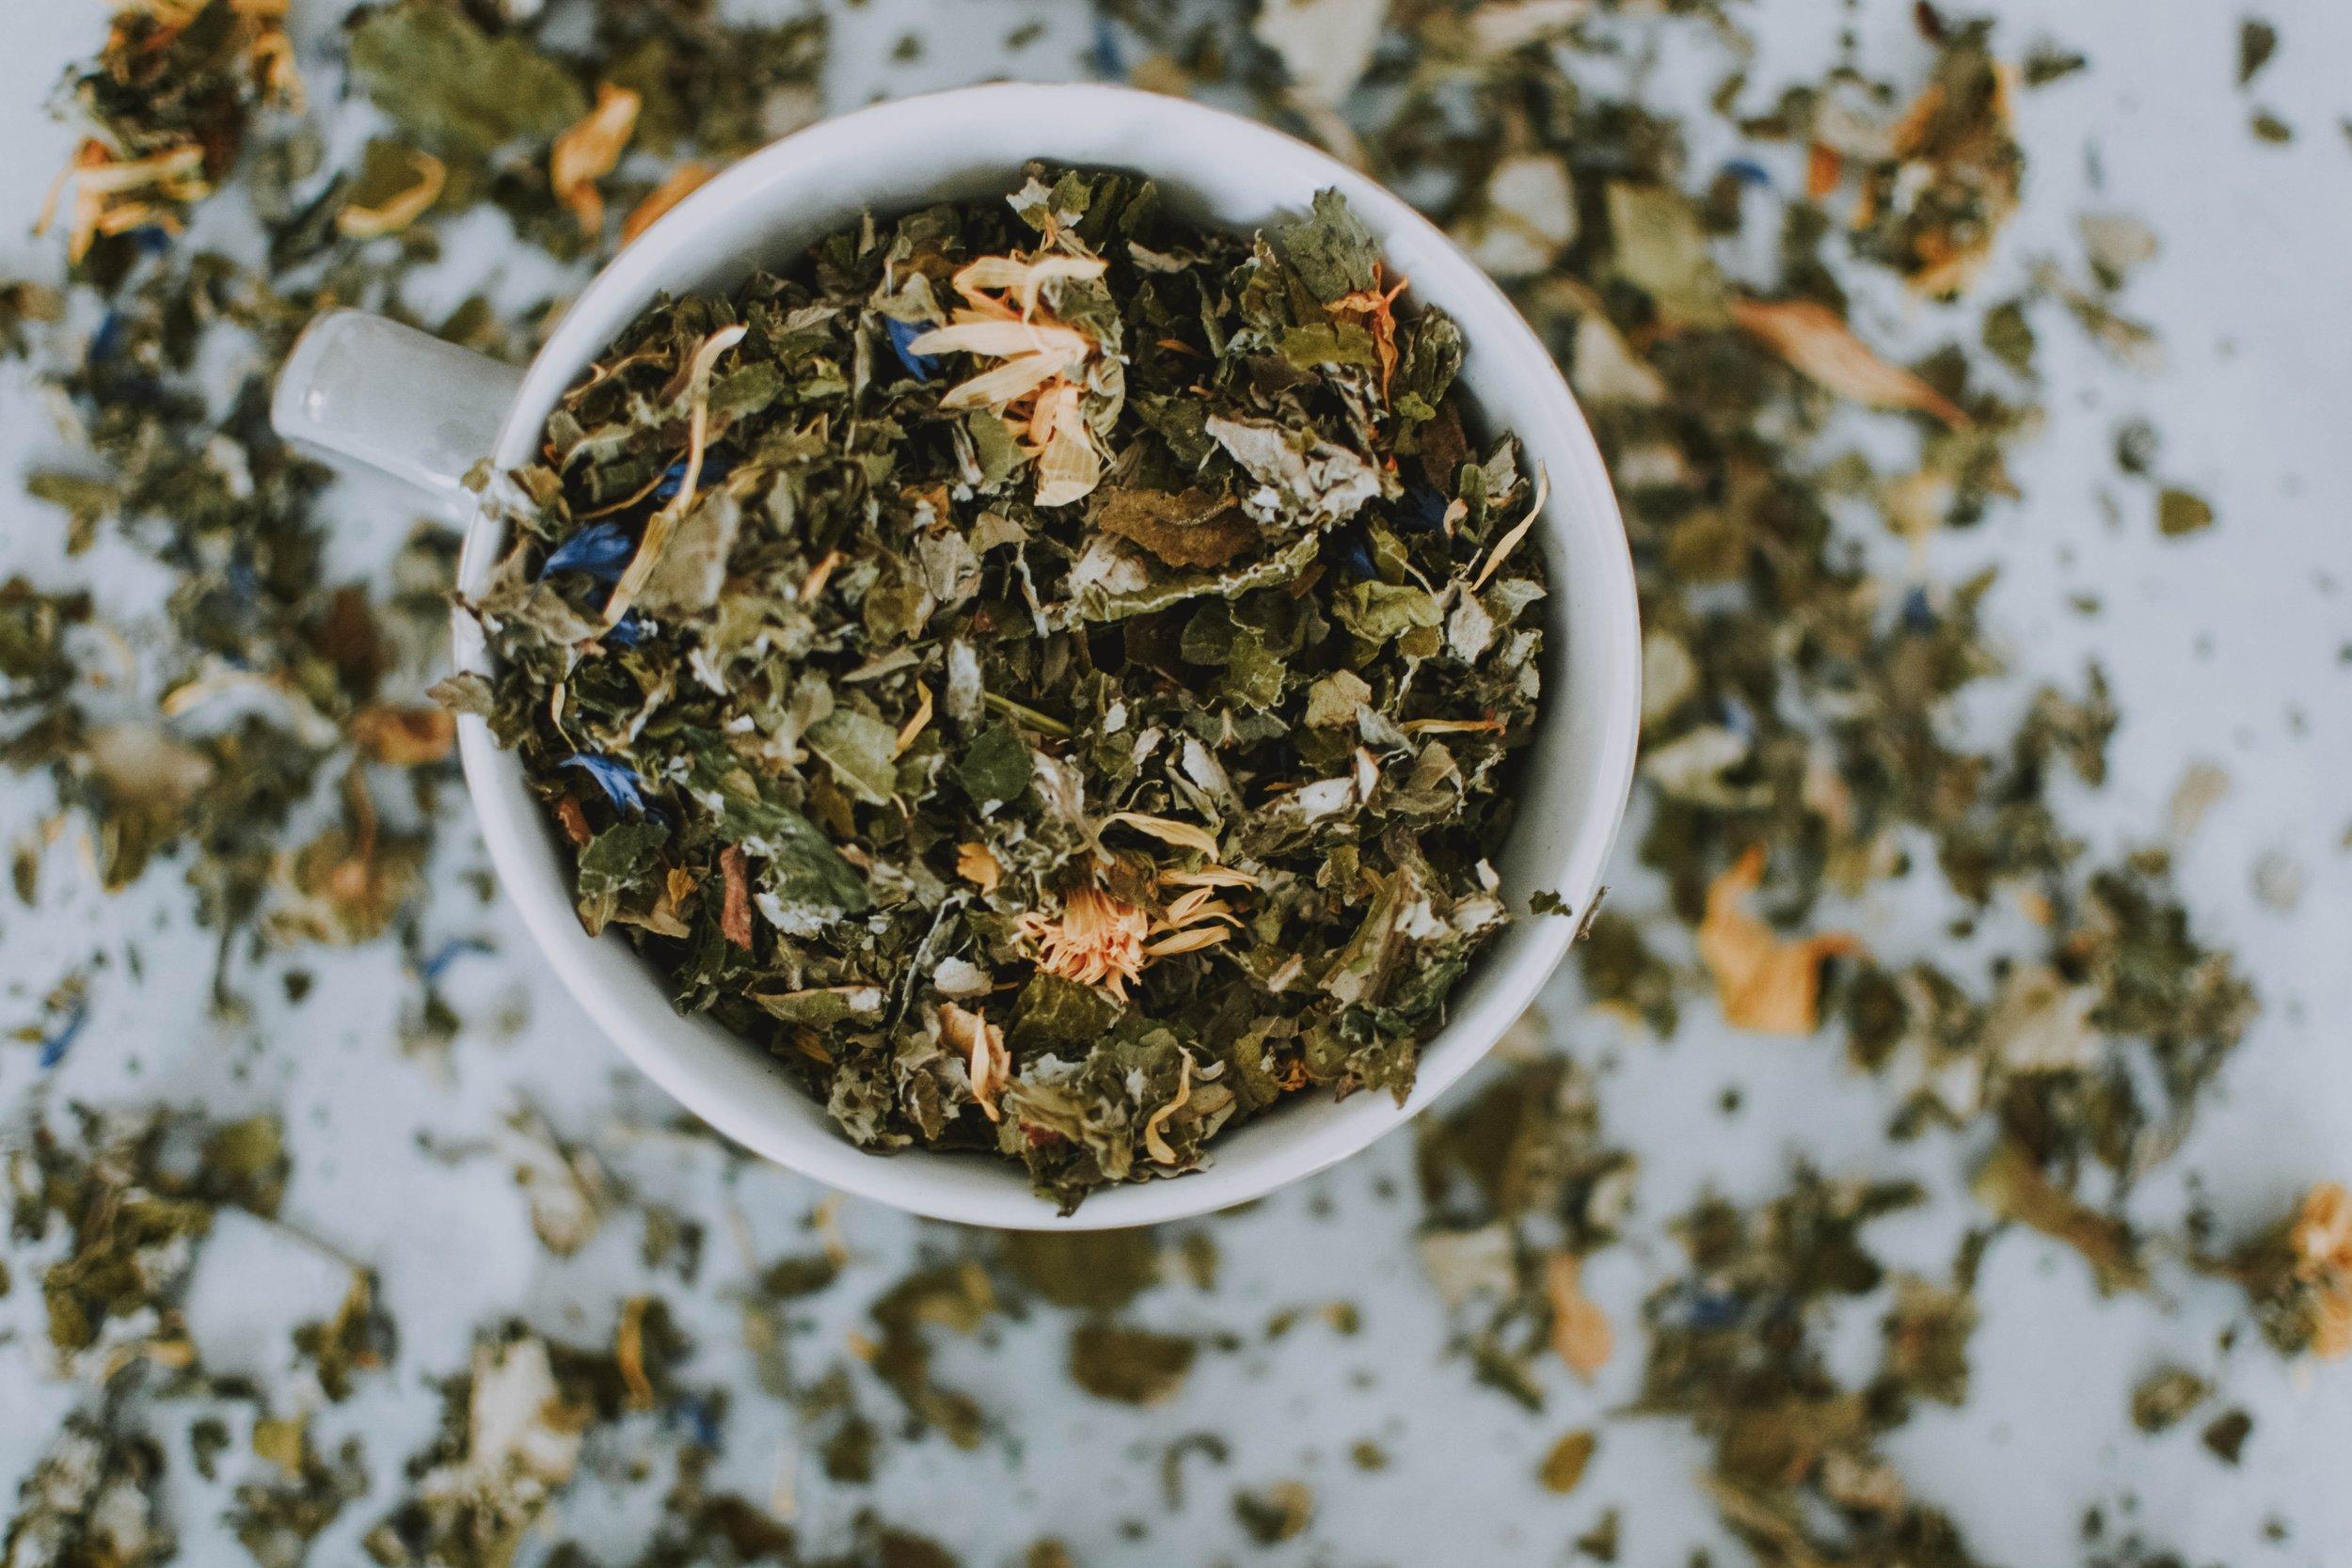 Liver cleansing herbal tea